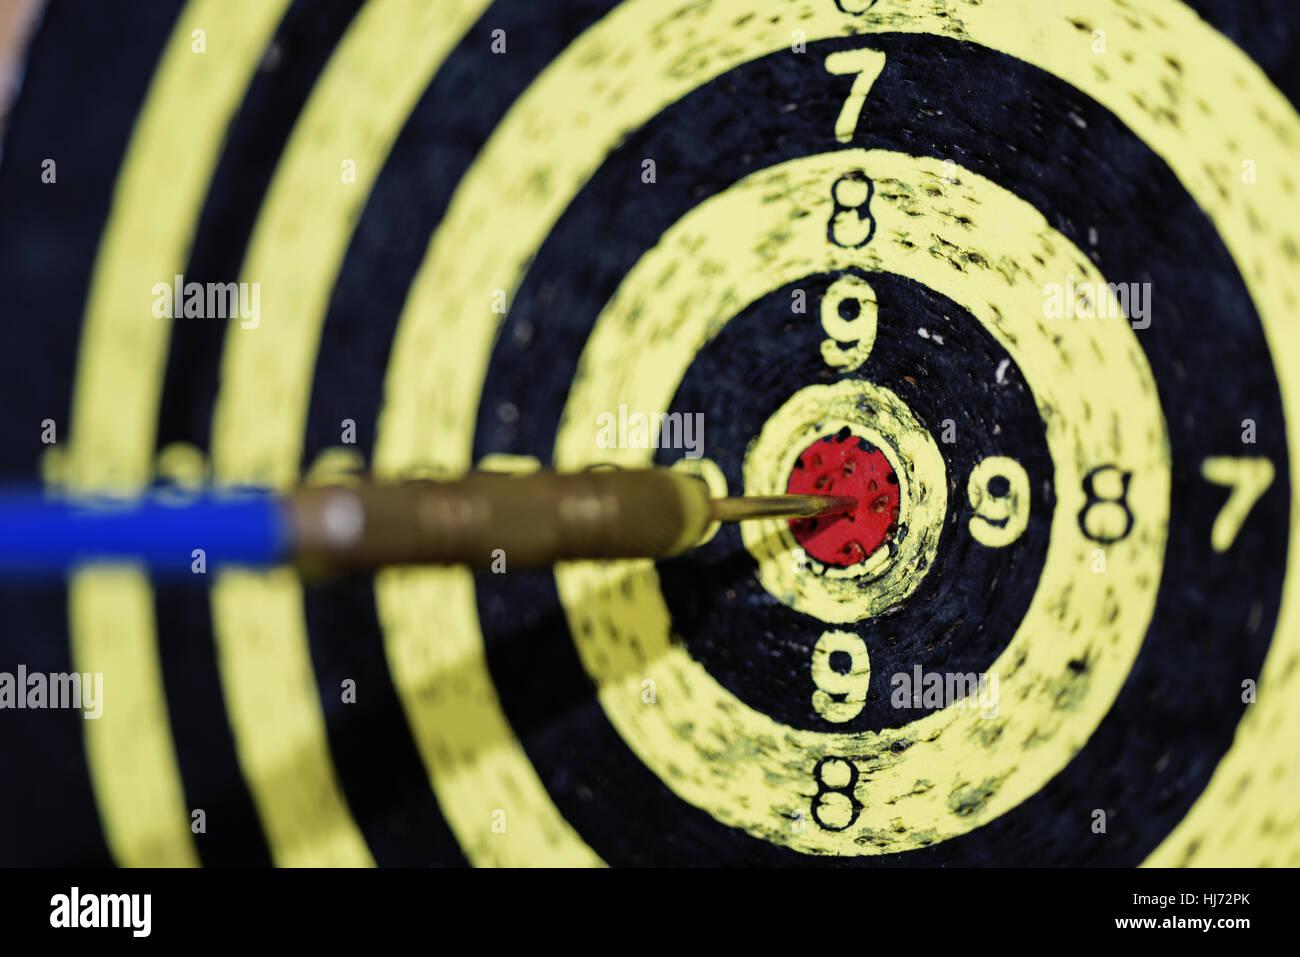 Abstract photo of darts. - Stock Image